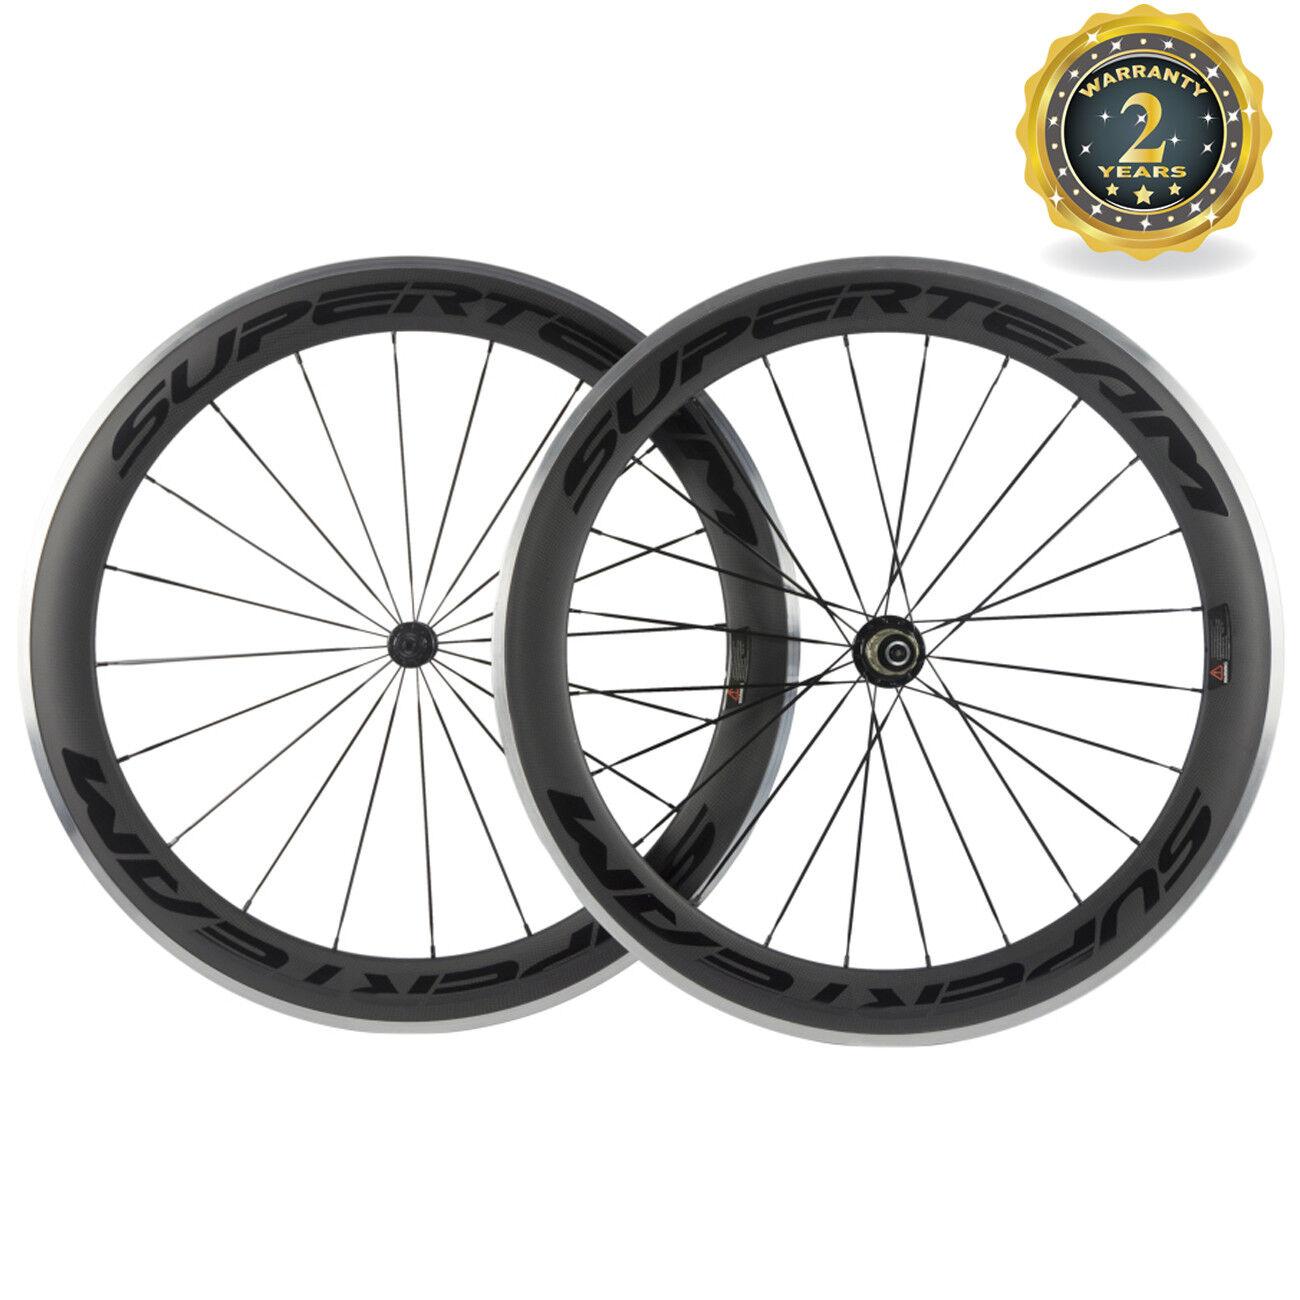 Superteam Alloy  Brake Surface Carbon Wheelset 60mm Deep Road Bike Carbon Wheel  order now lowest prices